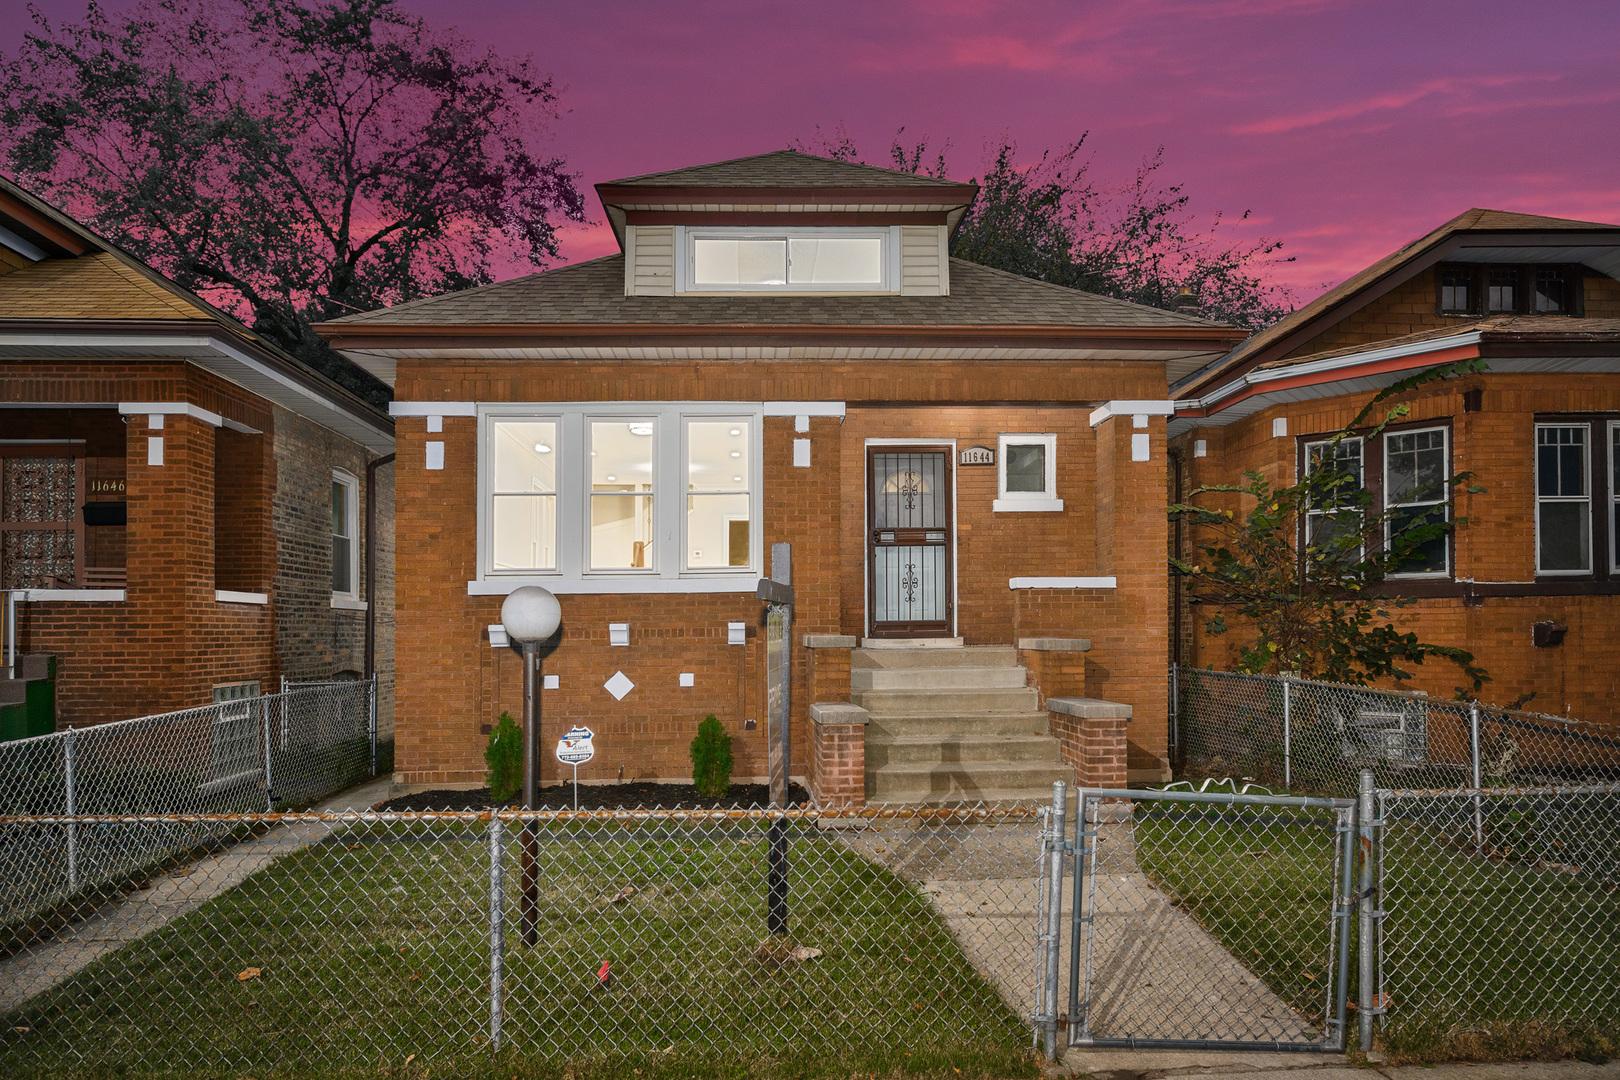 11644 S Lowe Avenue, Chicago IL 60628